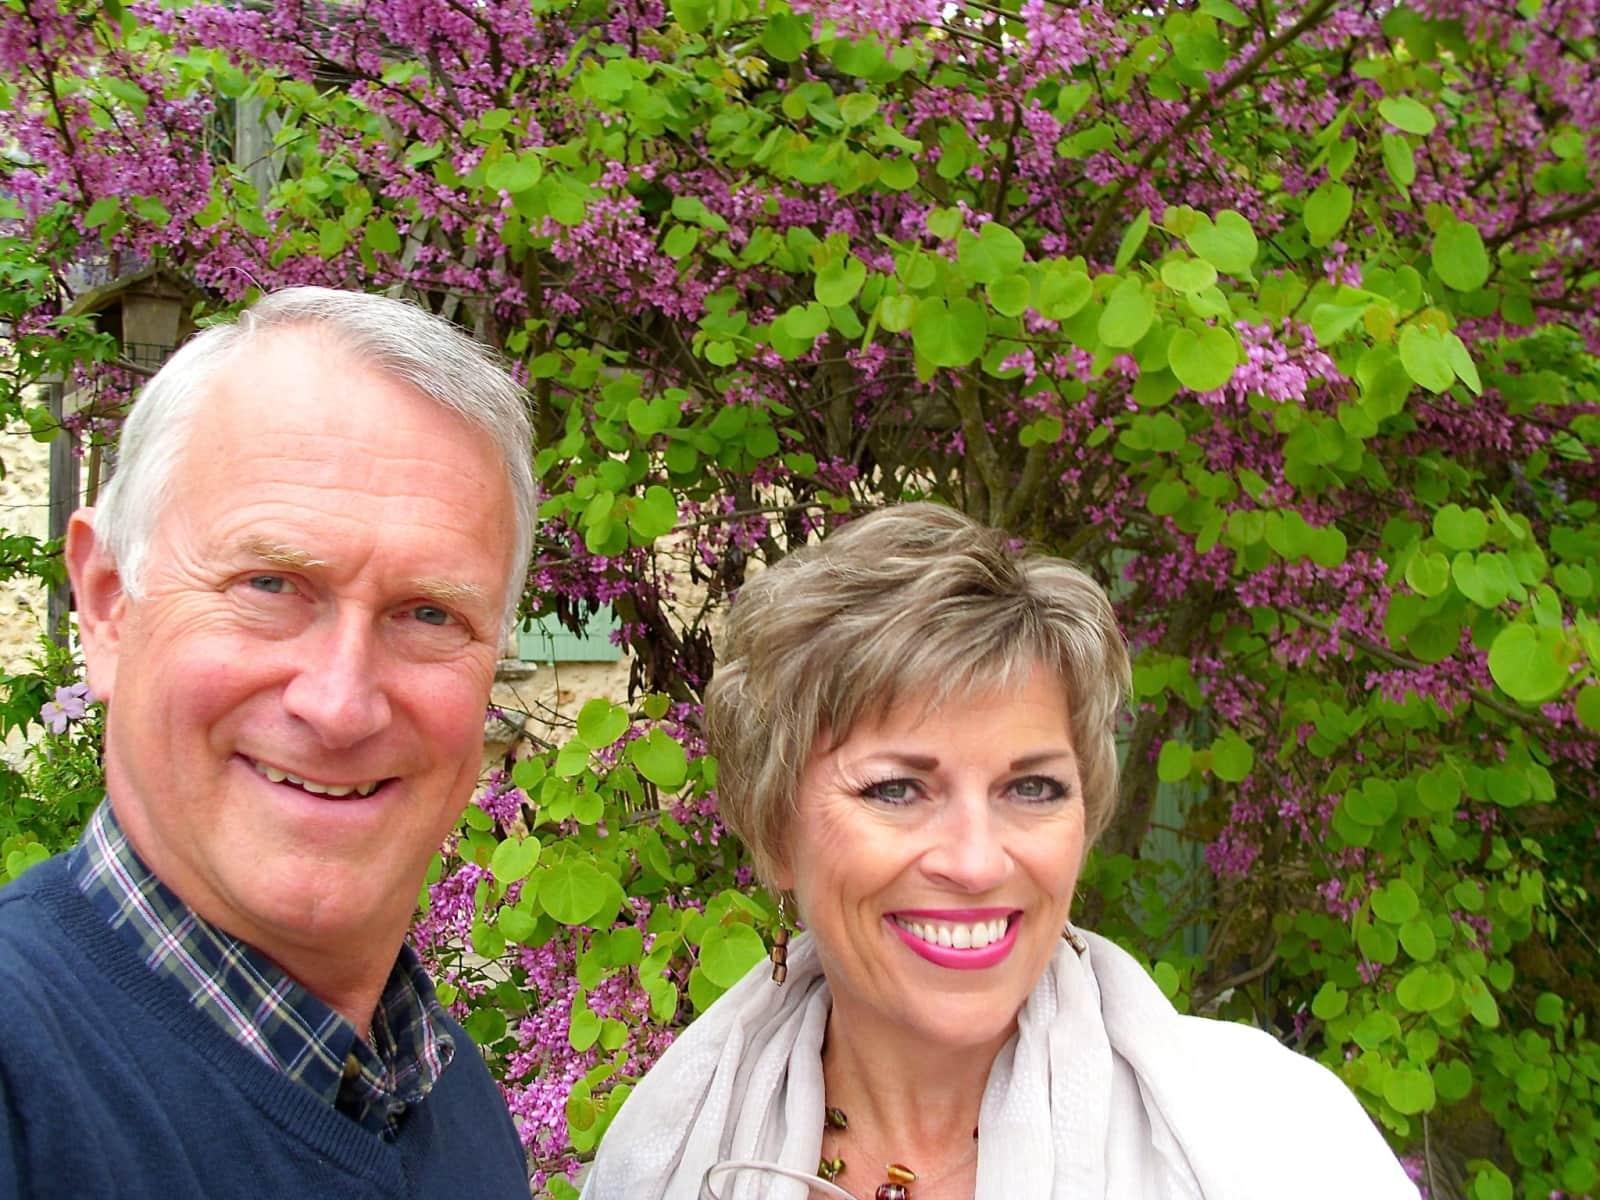 Richard & Dana from Halifax, Nova Scotia, Canada